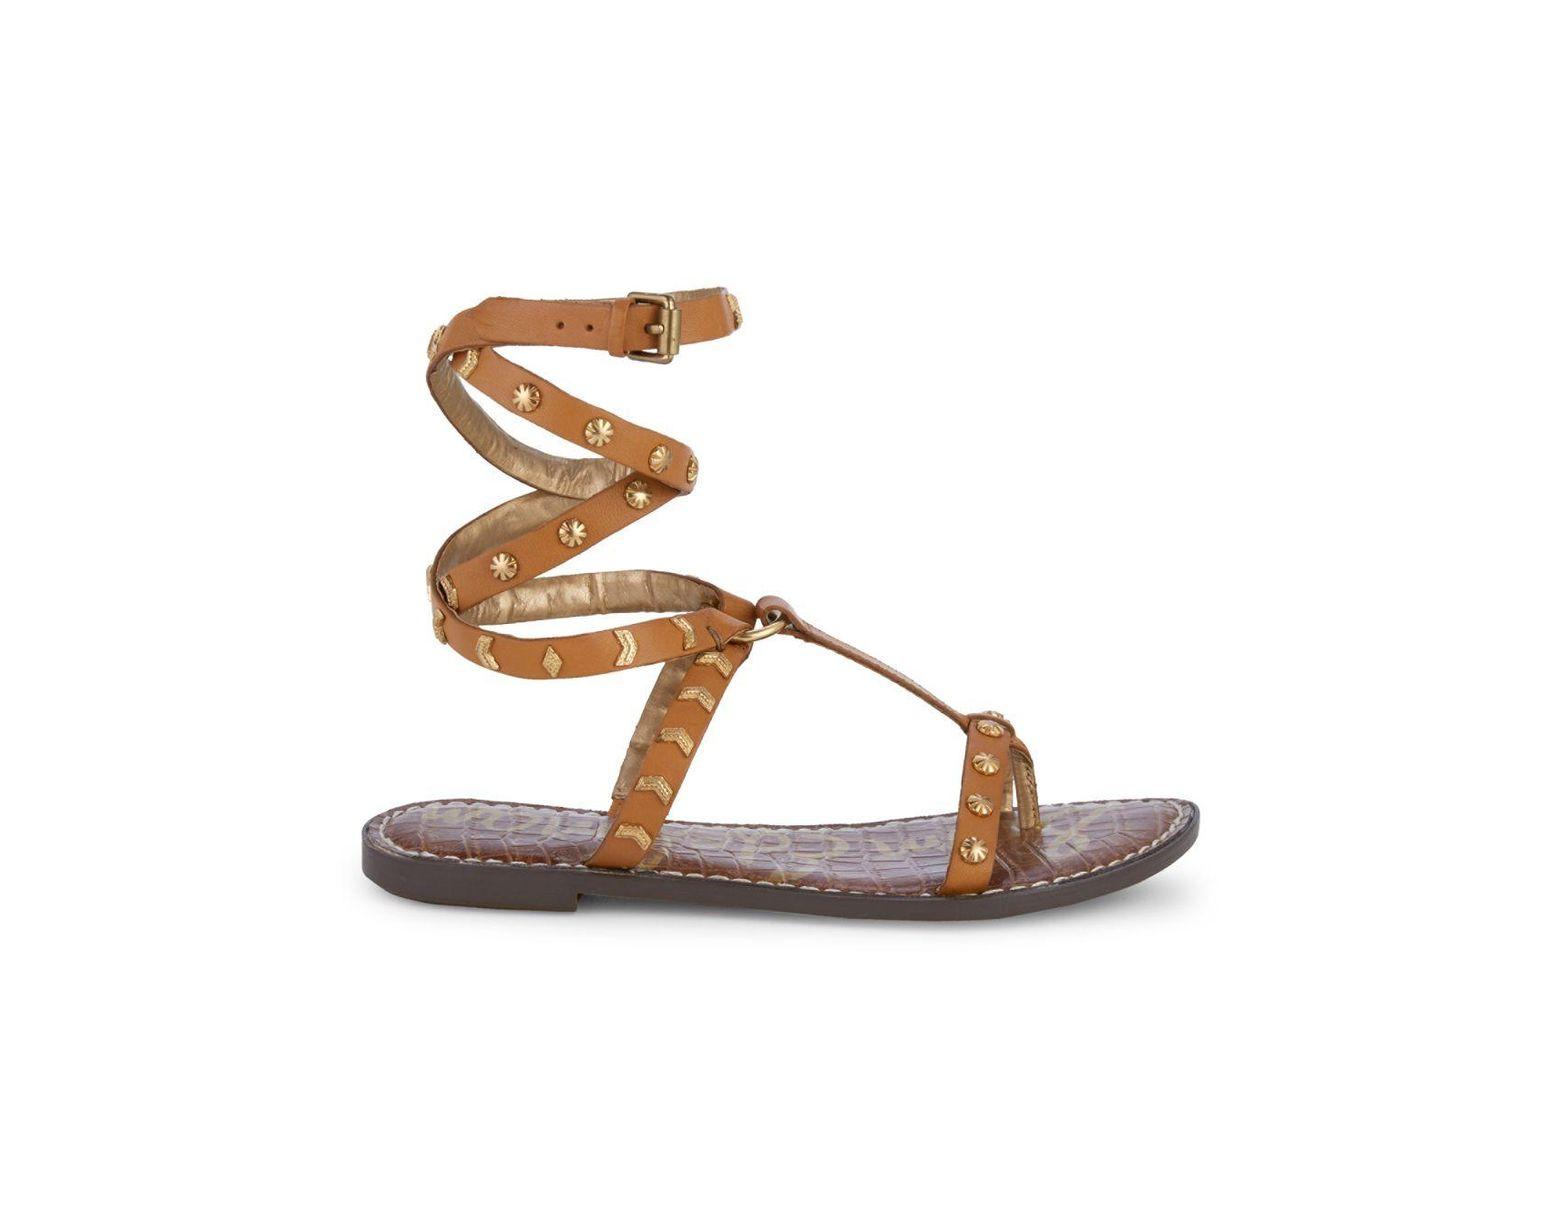 Wraparound Sandals Women's Studded Glendale Brown 3FJu1lKTc